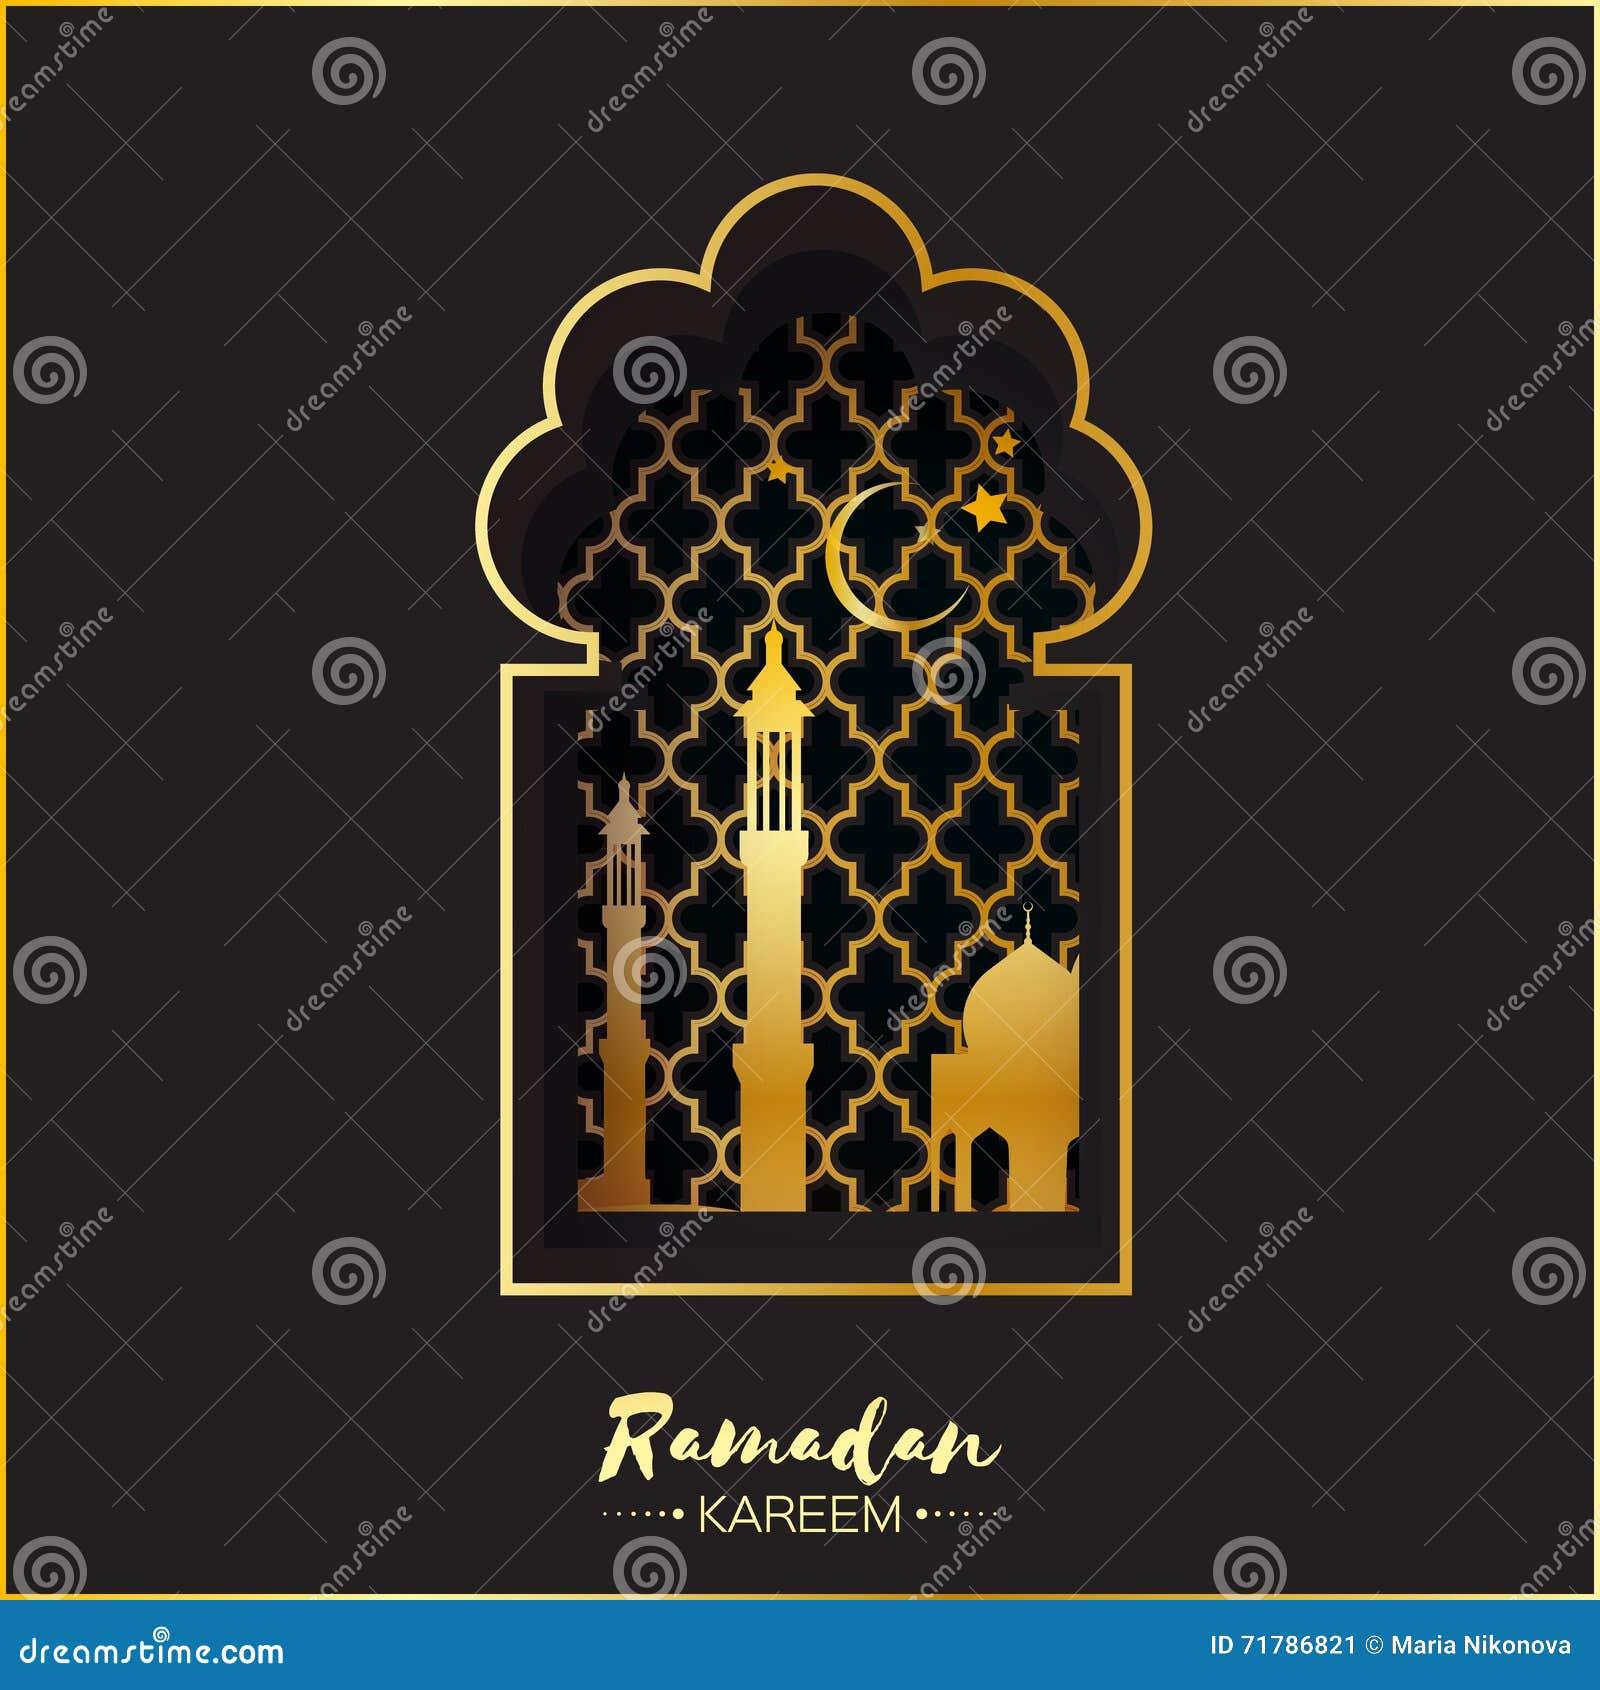 Black gold origami mosque window for ramadan kareem greeting card download black gold origami mosque window for ramadan kareem greeting card stock vector illustration m4hsunfo